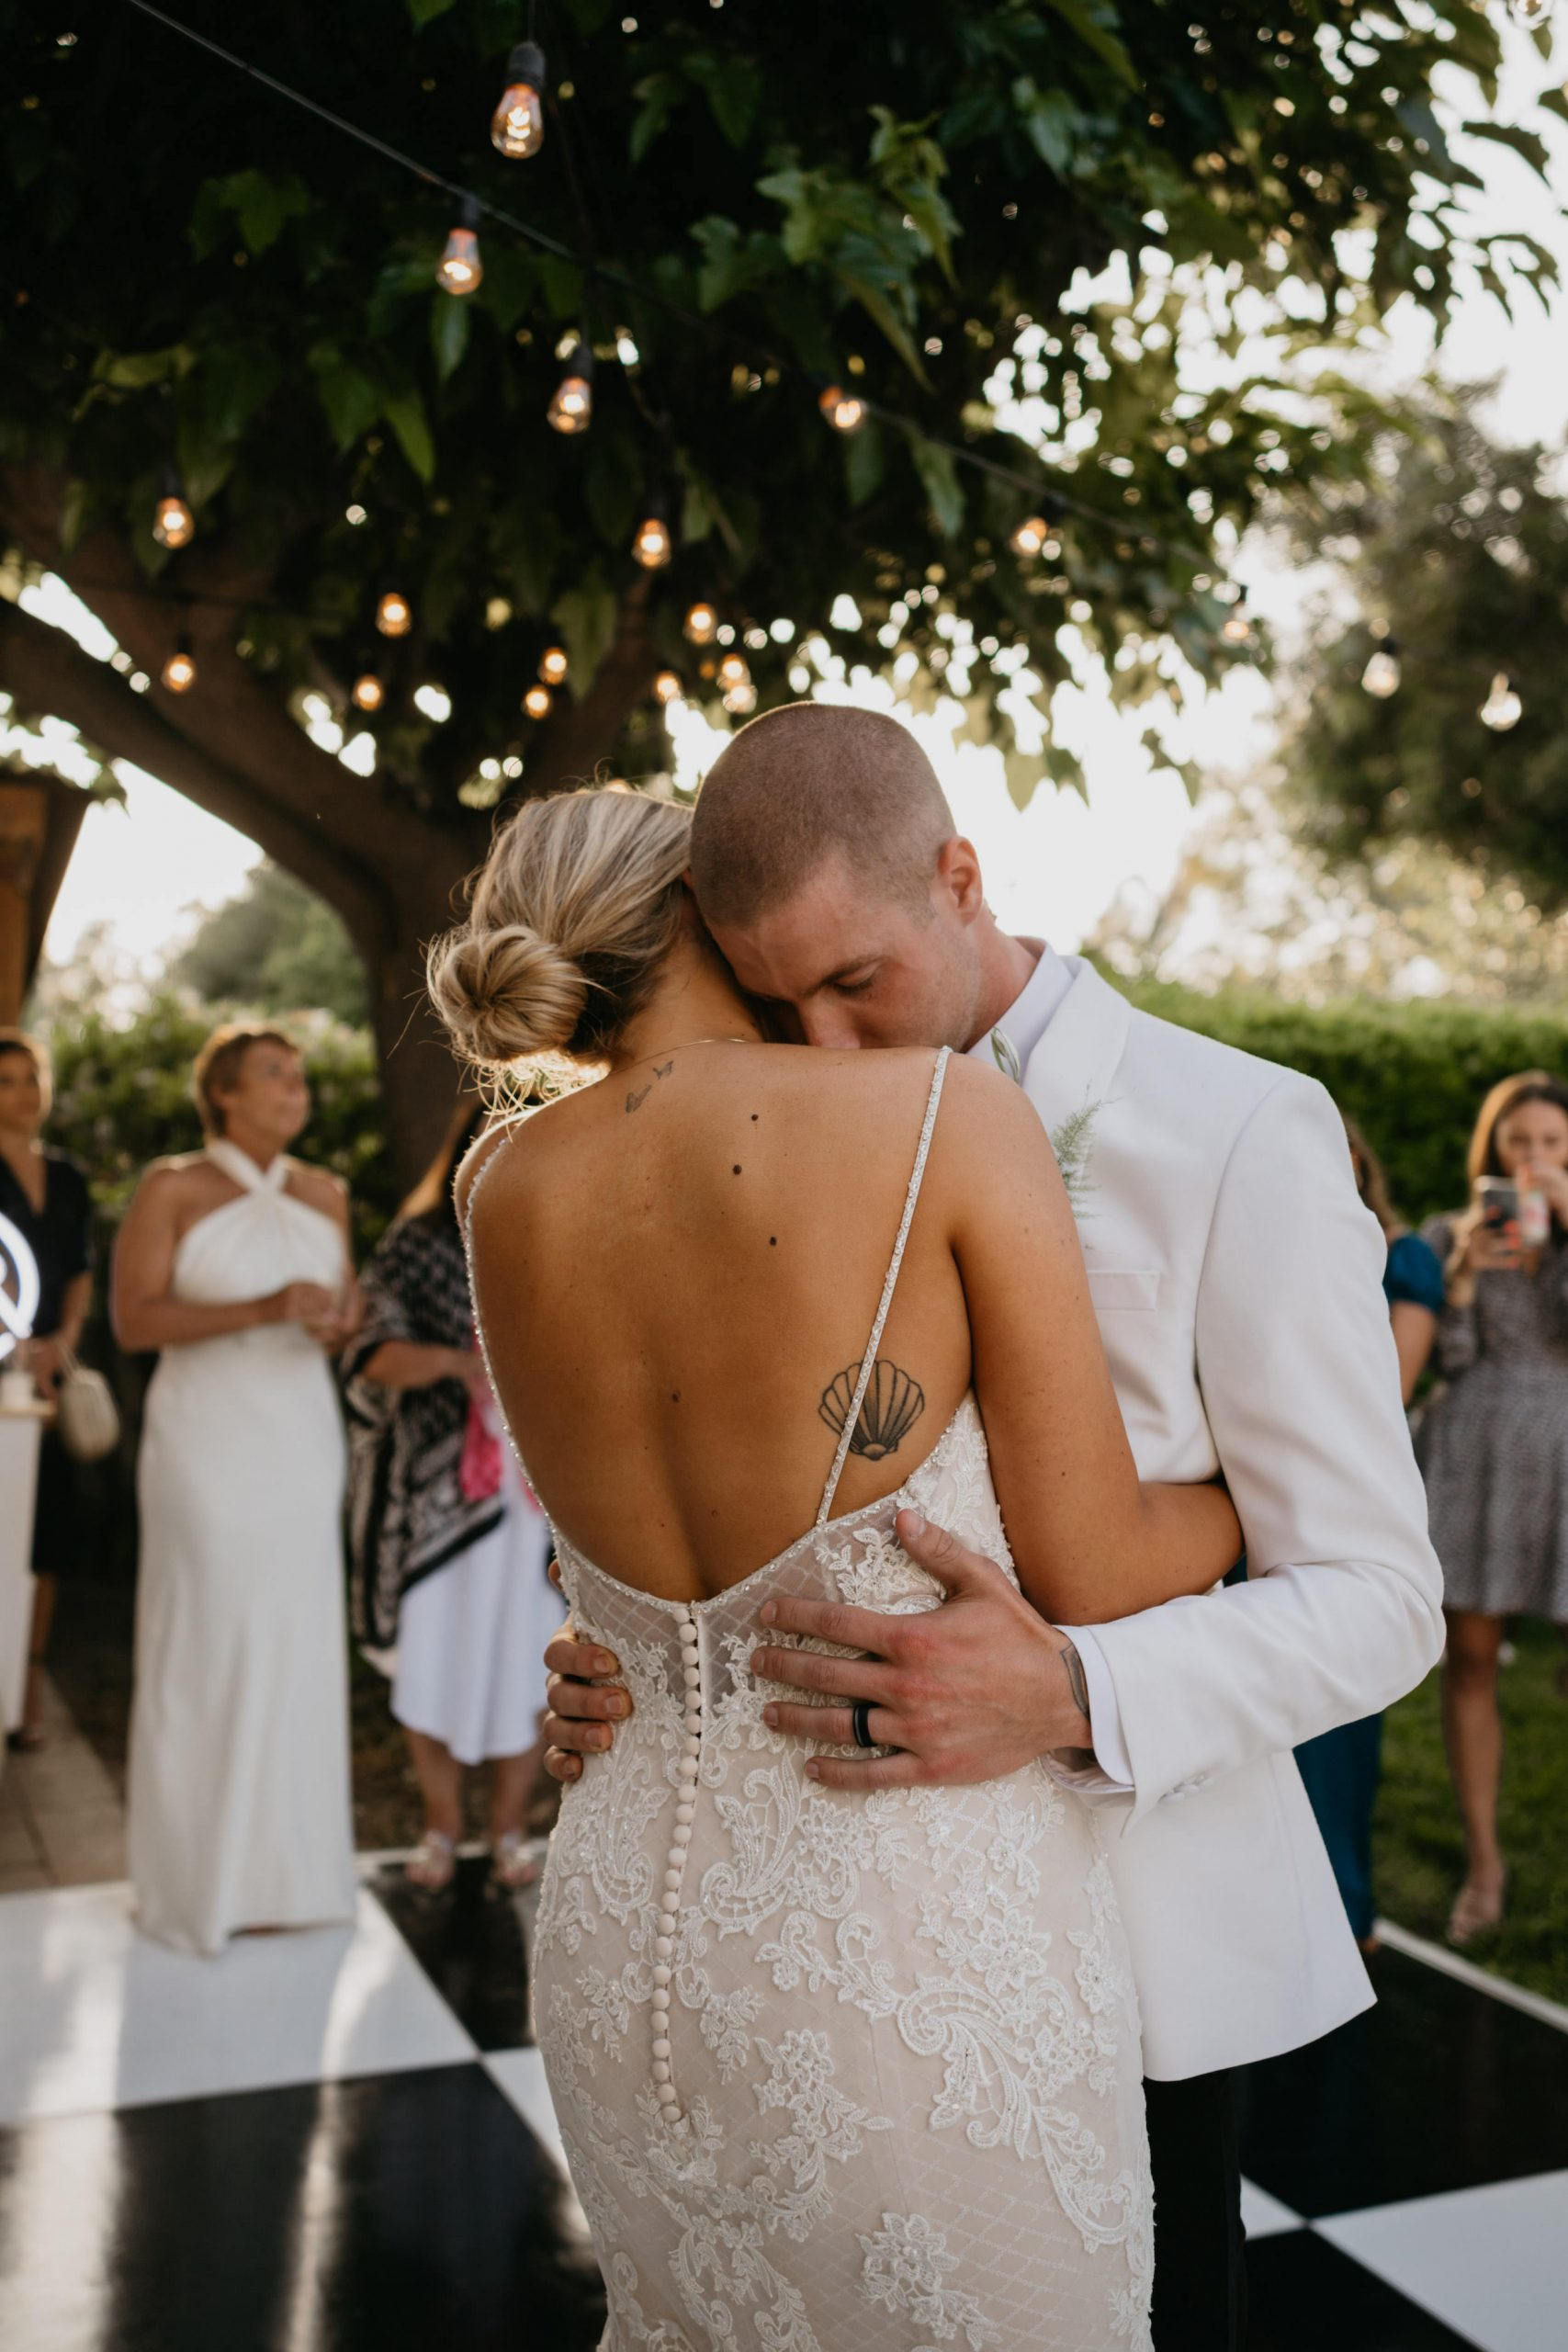 Bride and Groom First Dance in Laguna Beach Backyard Wedding, image by Fatima Elreda Photo